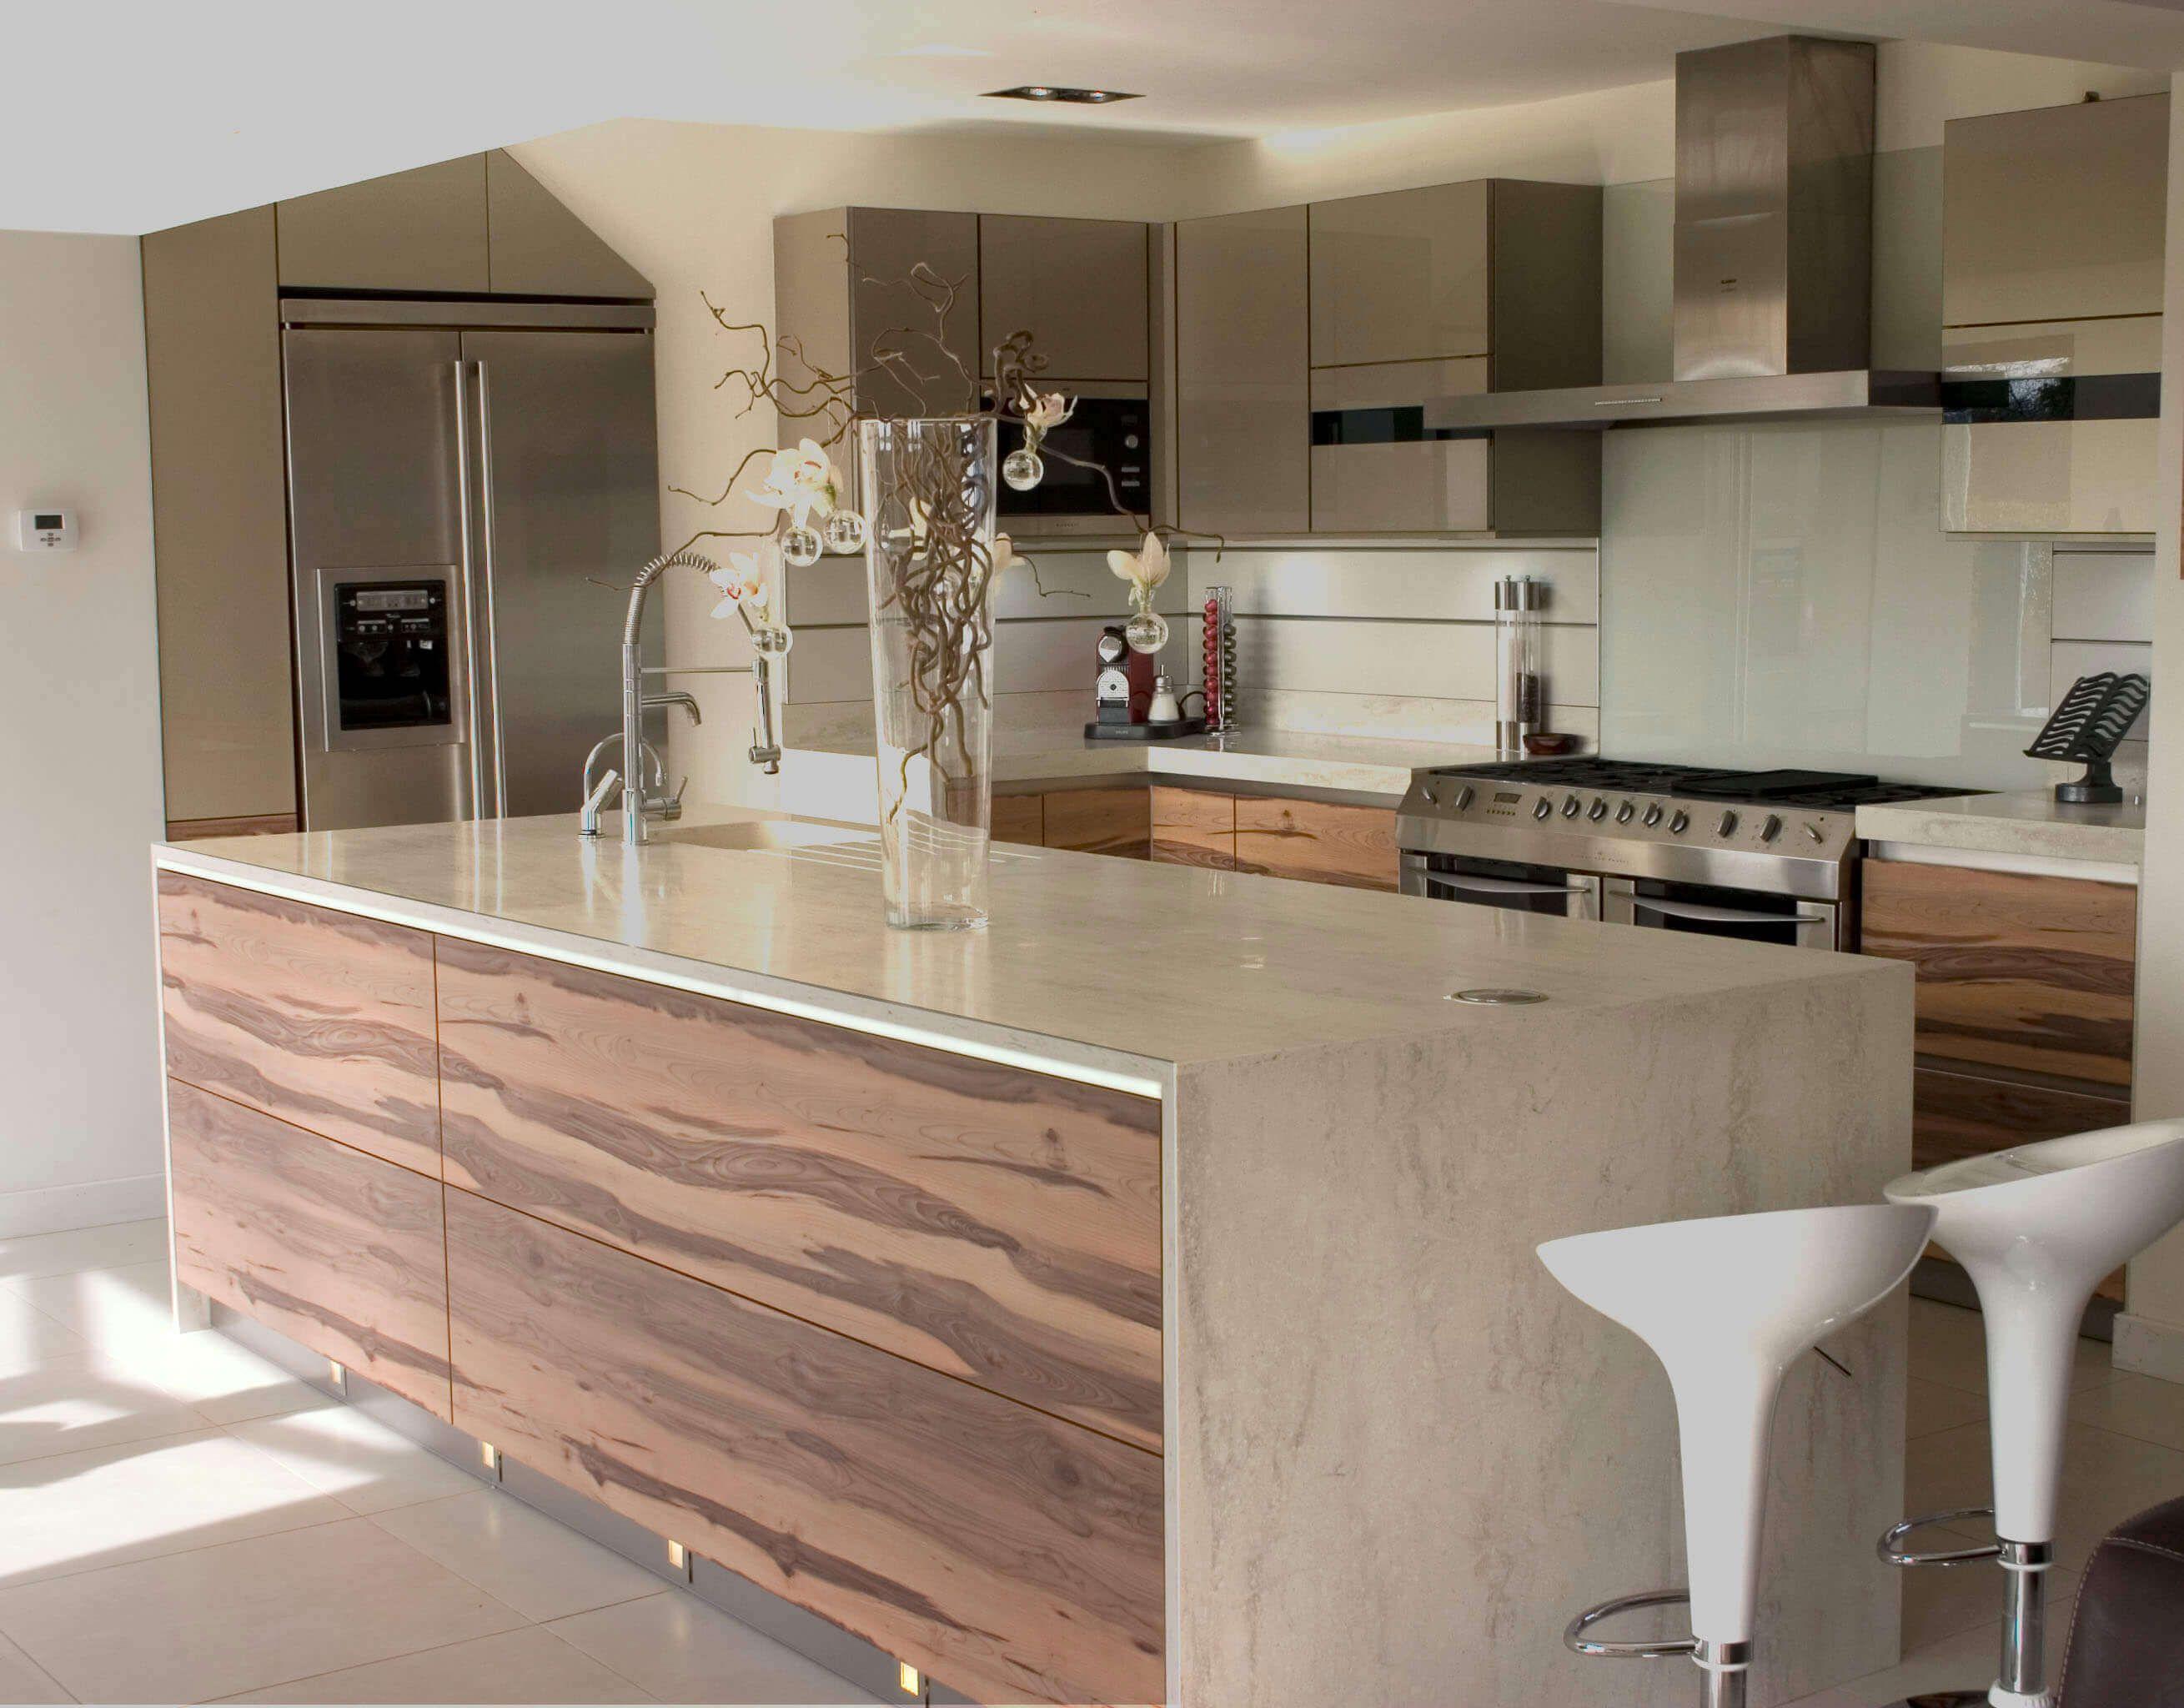 89 Contemporary Kitchen Design Ideas Gallery Backsplashes Cabinets Lights Tables Islands Sinks Floors And More Modern Kitchen Island Modern Kitchen Granite Granite Countertops Kitchen